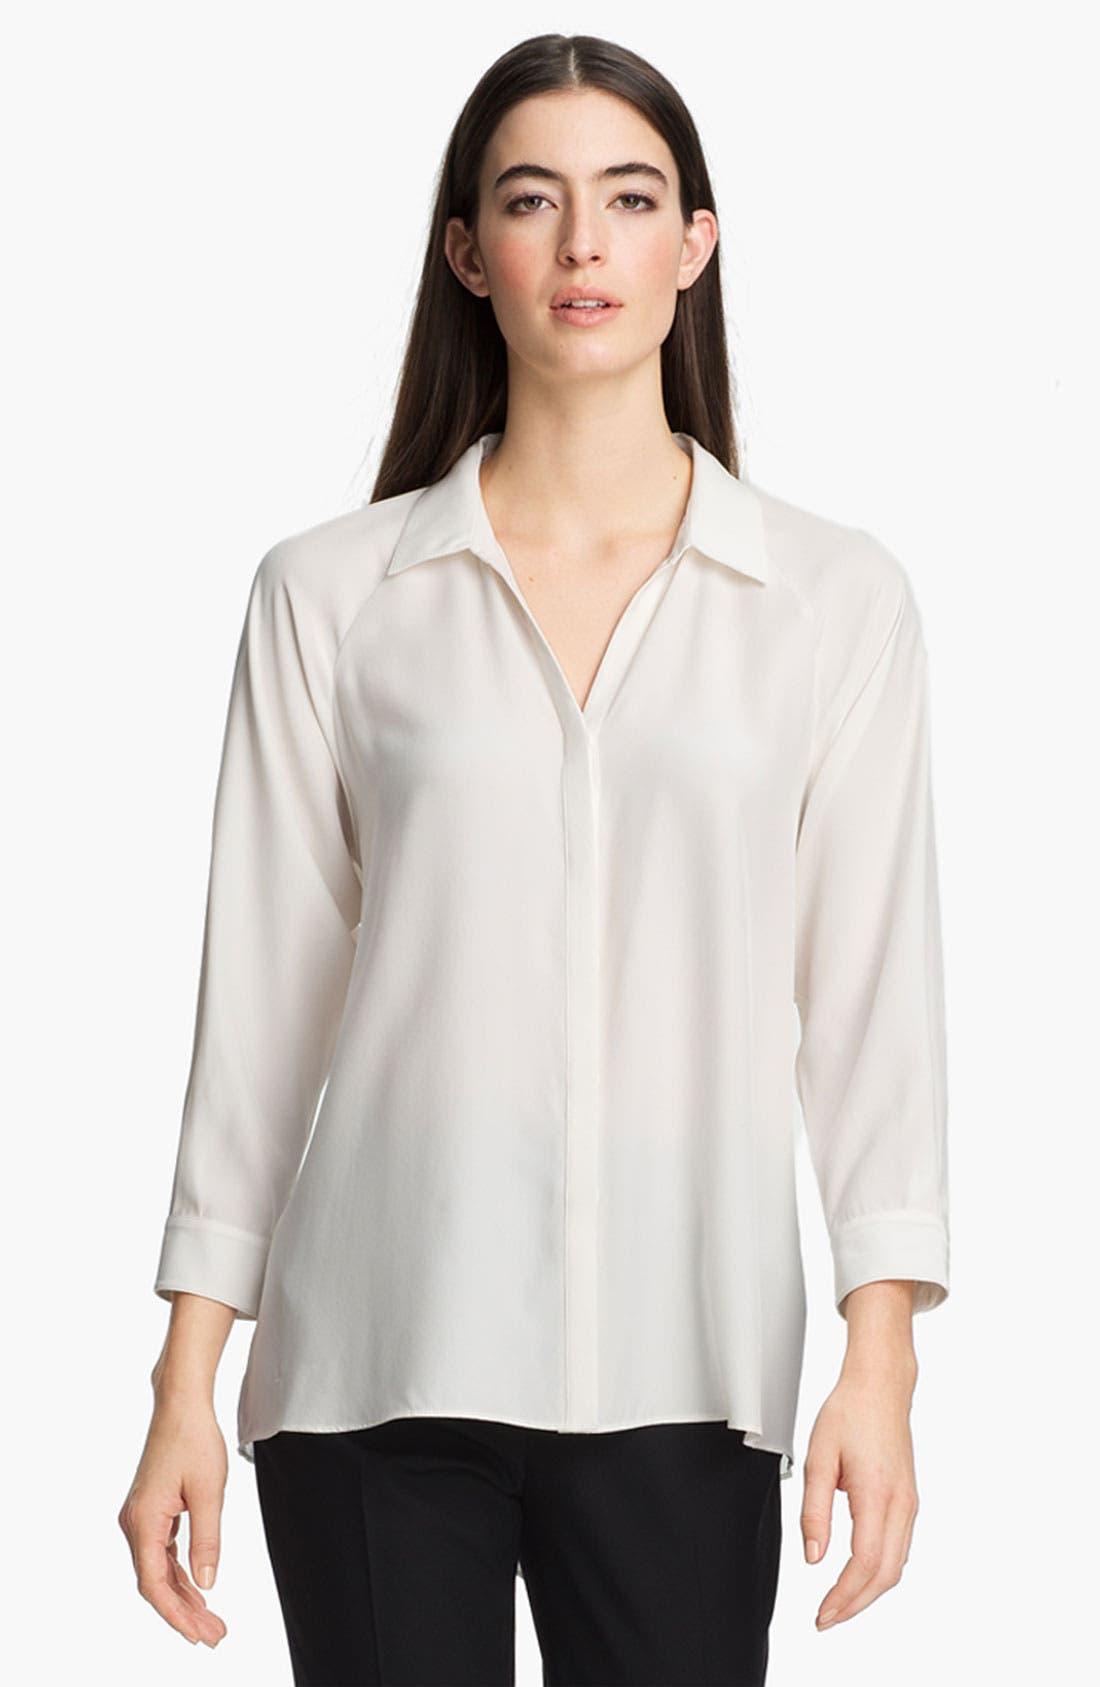 Alternate Image 1 Selected - Lafayette 148 New York 'Dalena' Matte Silk Blouse